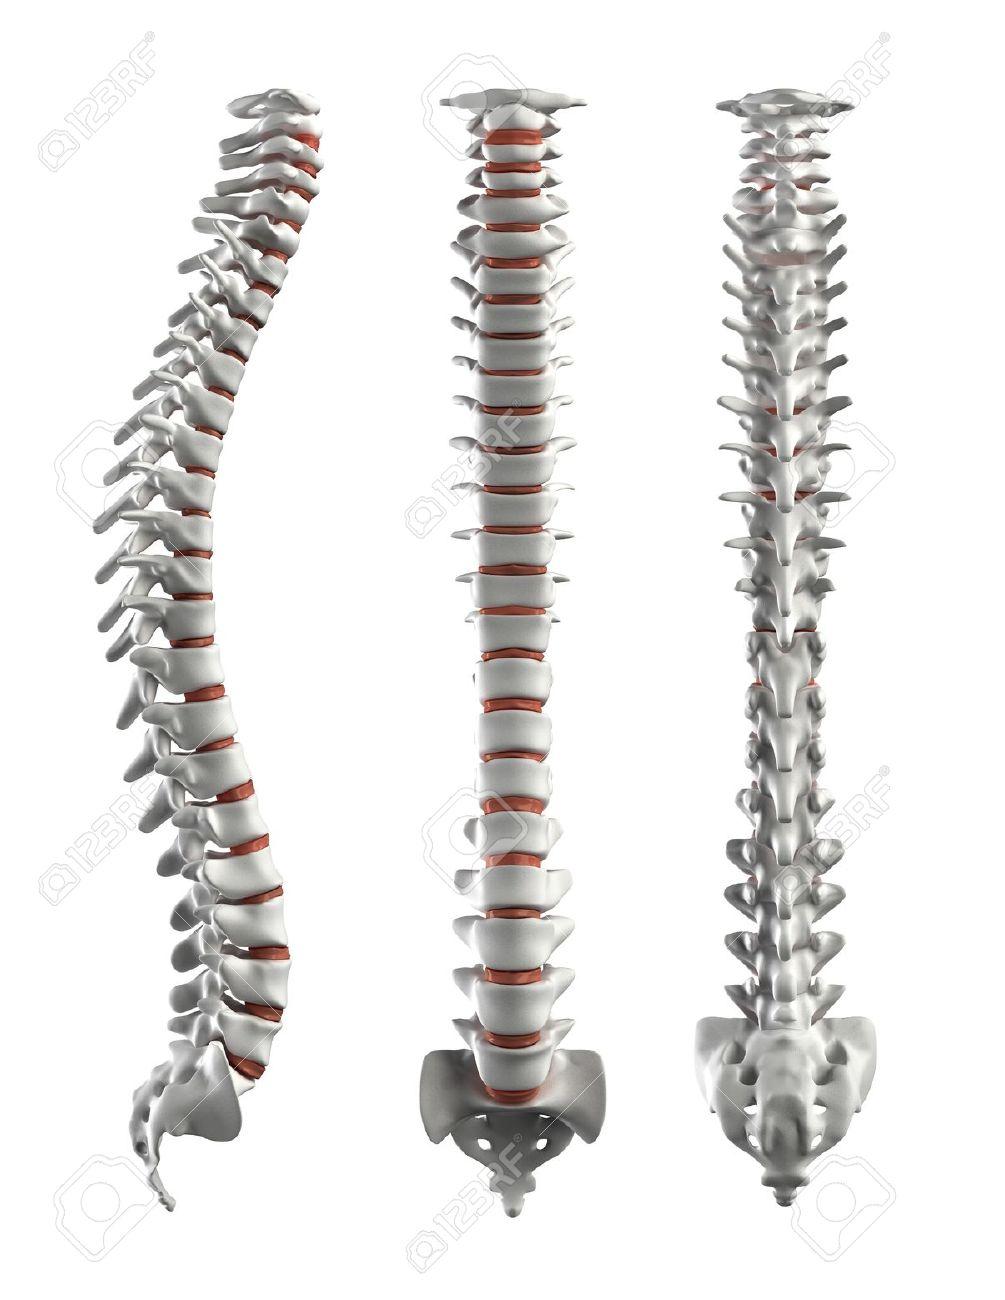 Detailed spine with Intervertebral discs Stock Photo - 9162851